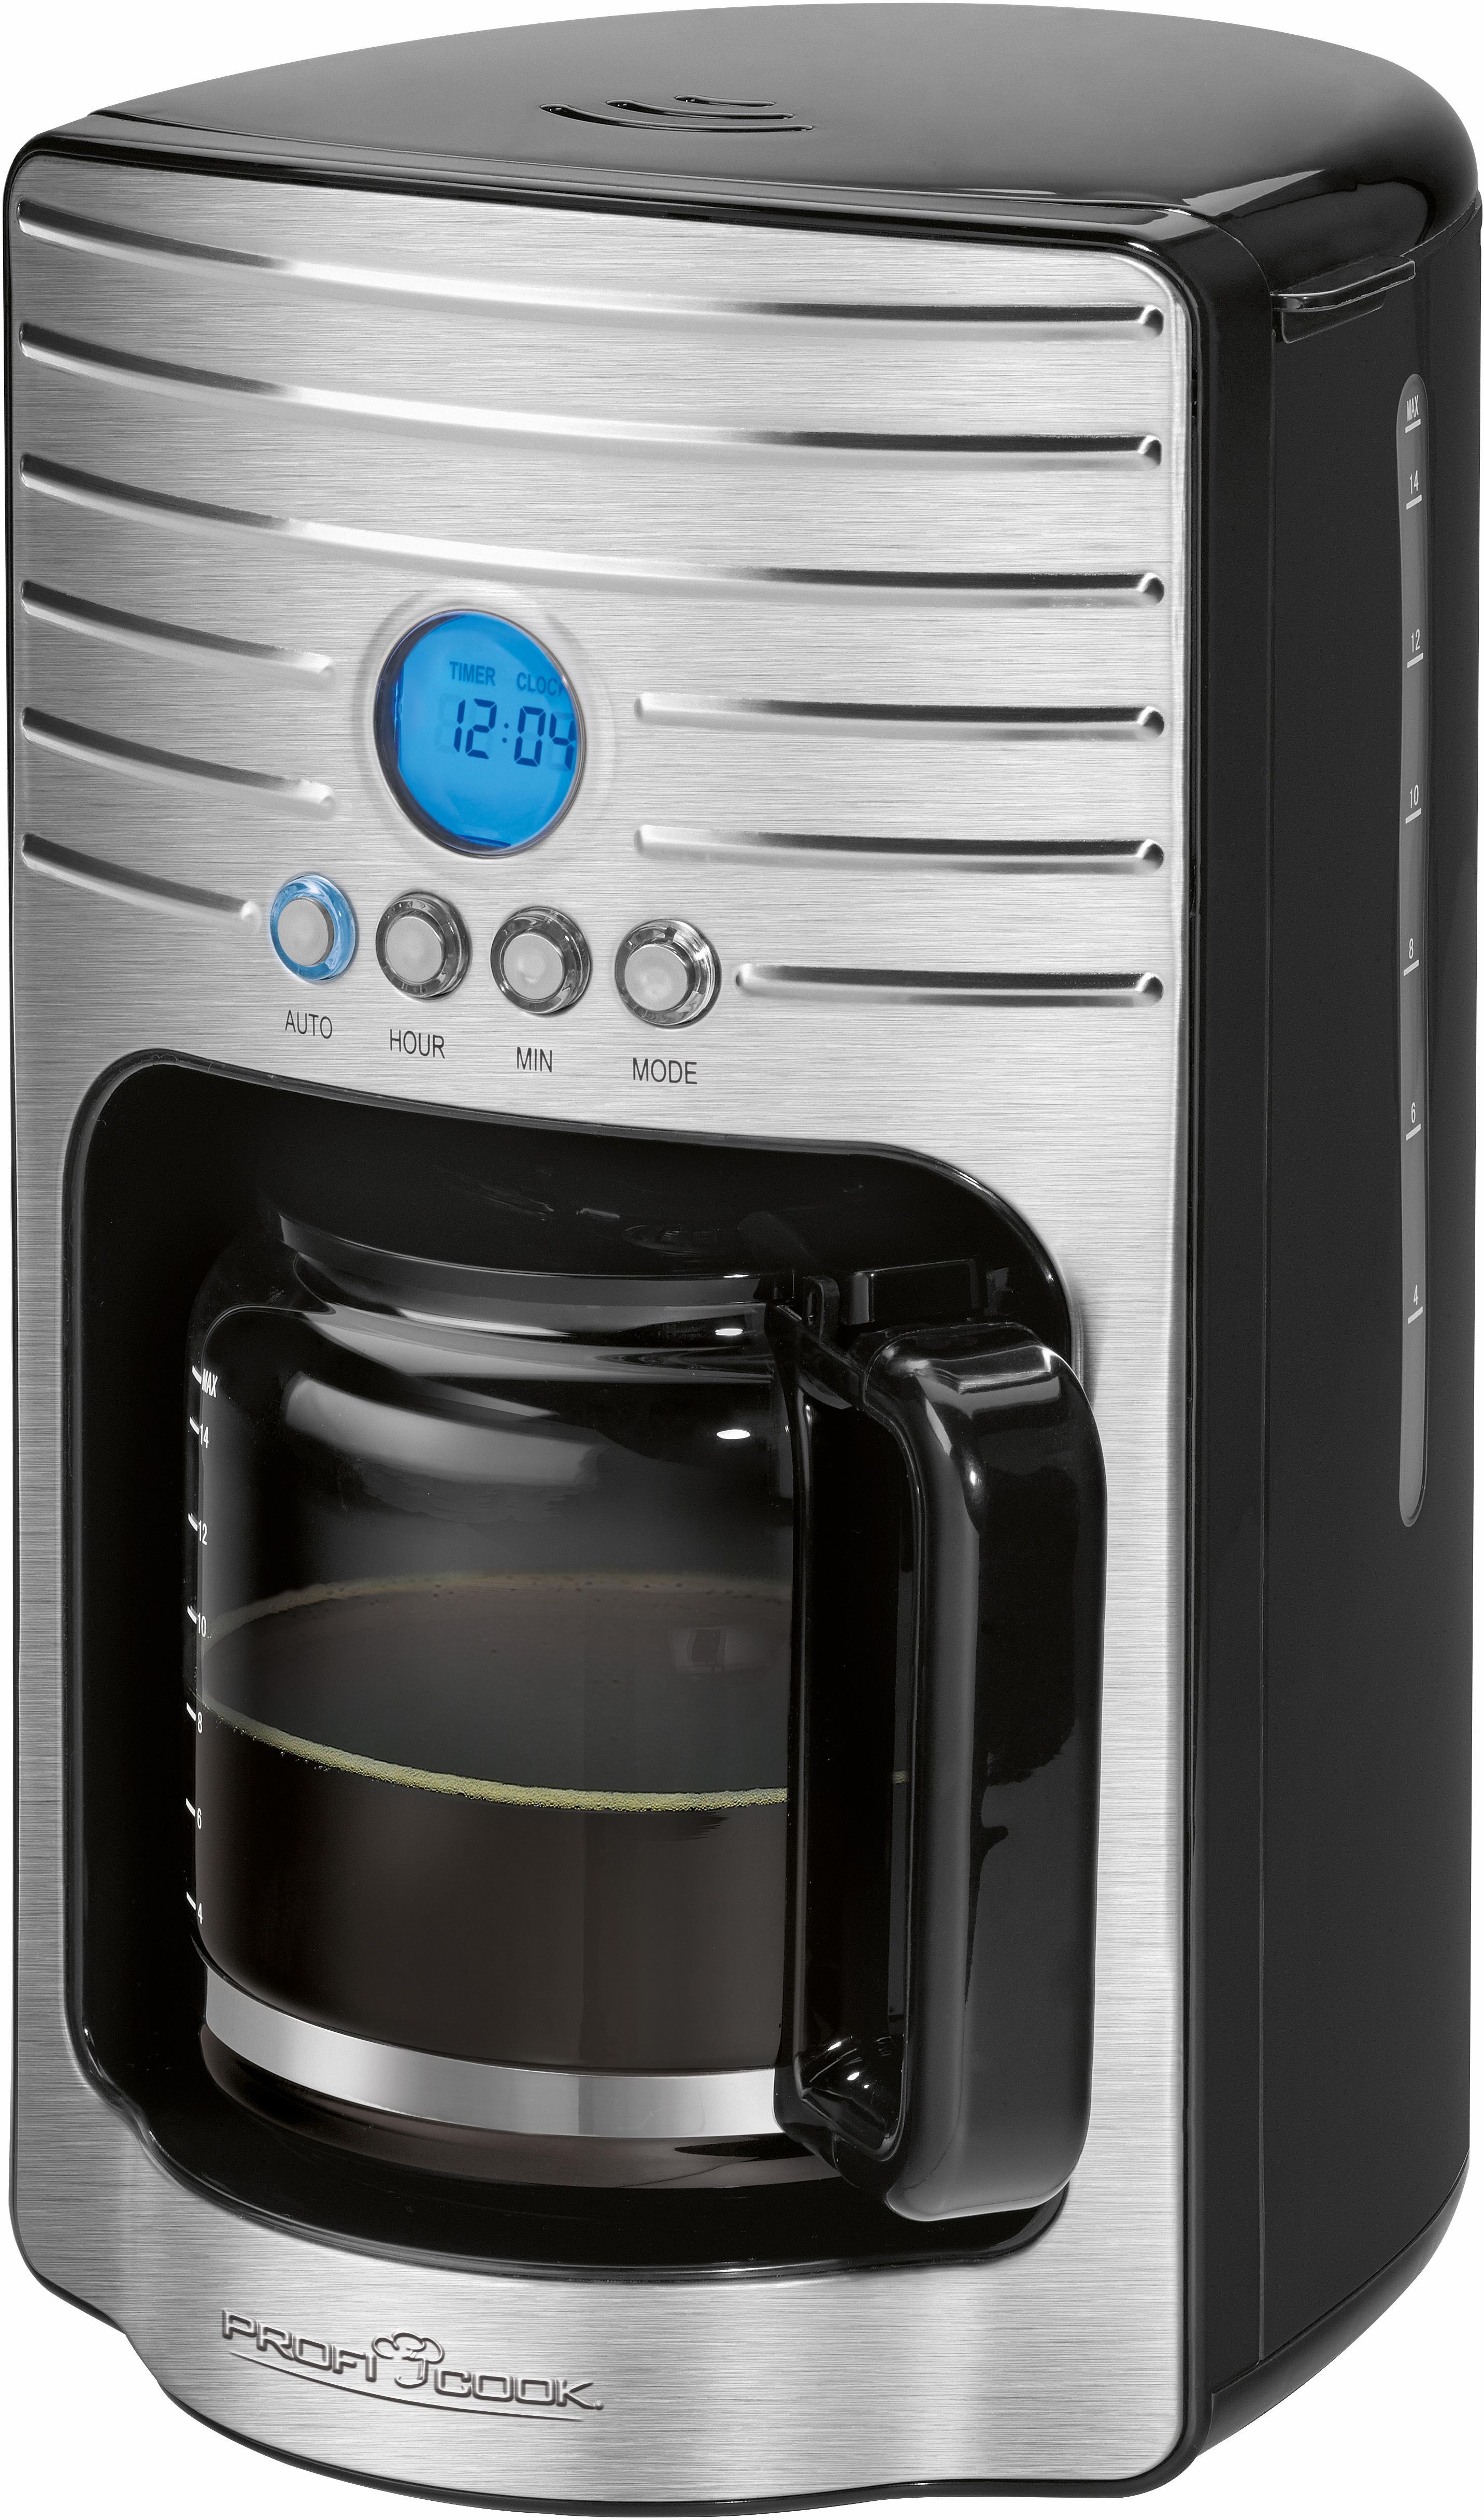 proficook filterkaffeemaschine pc ka 1120 filter 1x4 auf. Black Bedroom Furniture Sets. Home Design Ideas